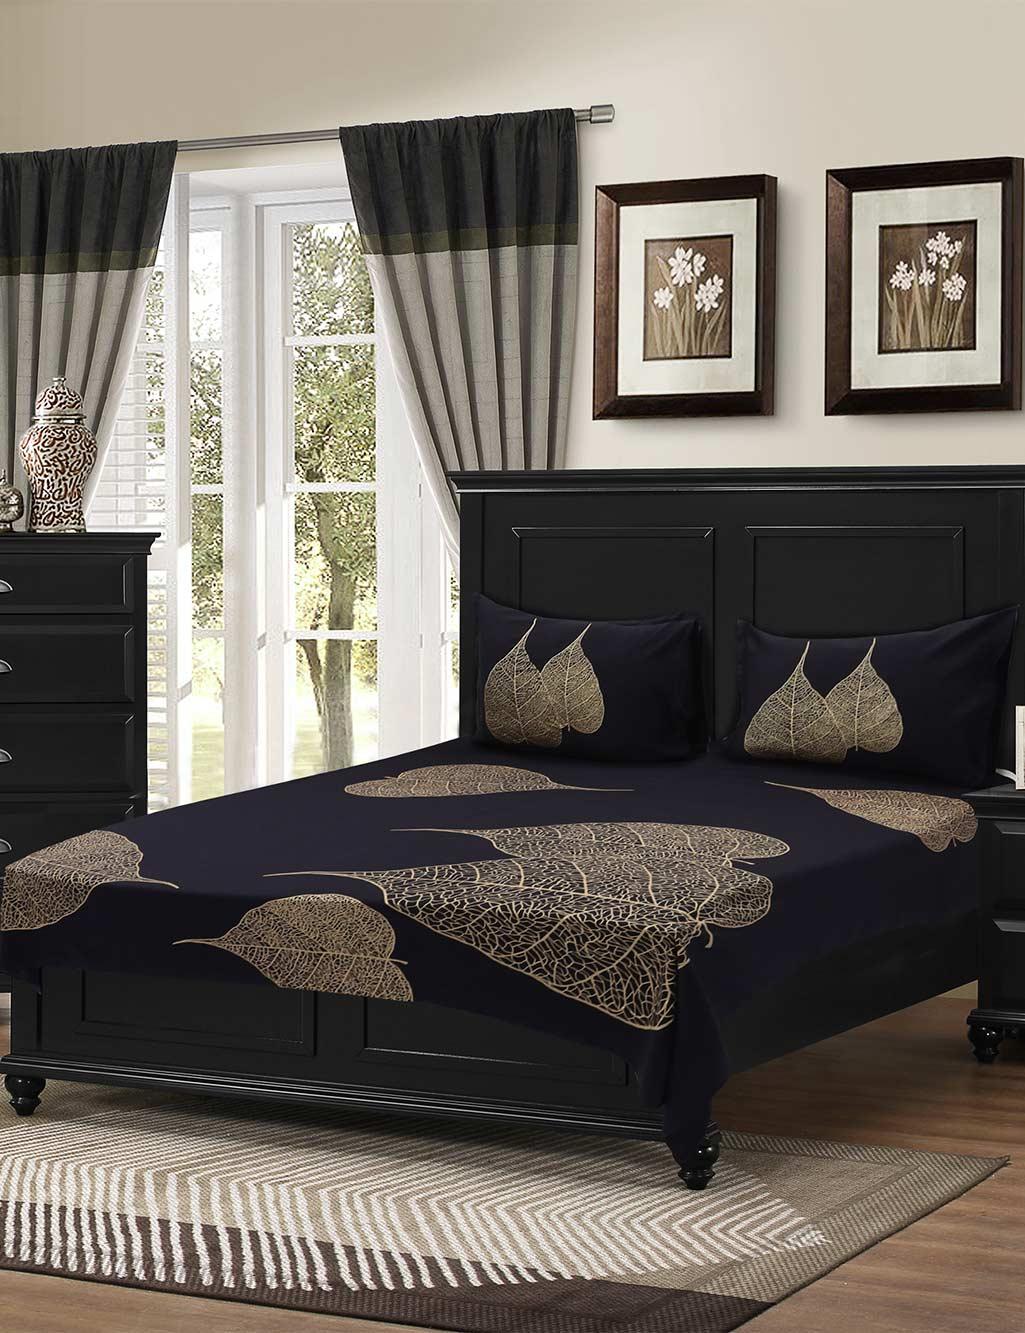 Wonderful Pick Any 1 Premium Cotton Satin Bedsheet + 2 Pillow Covers